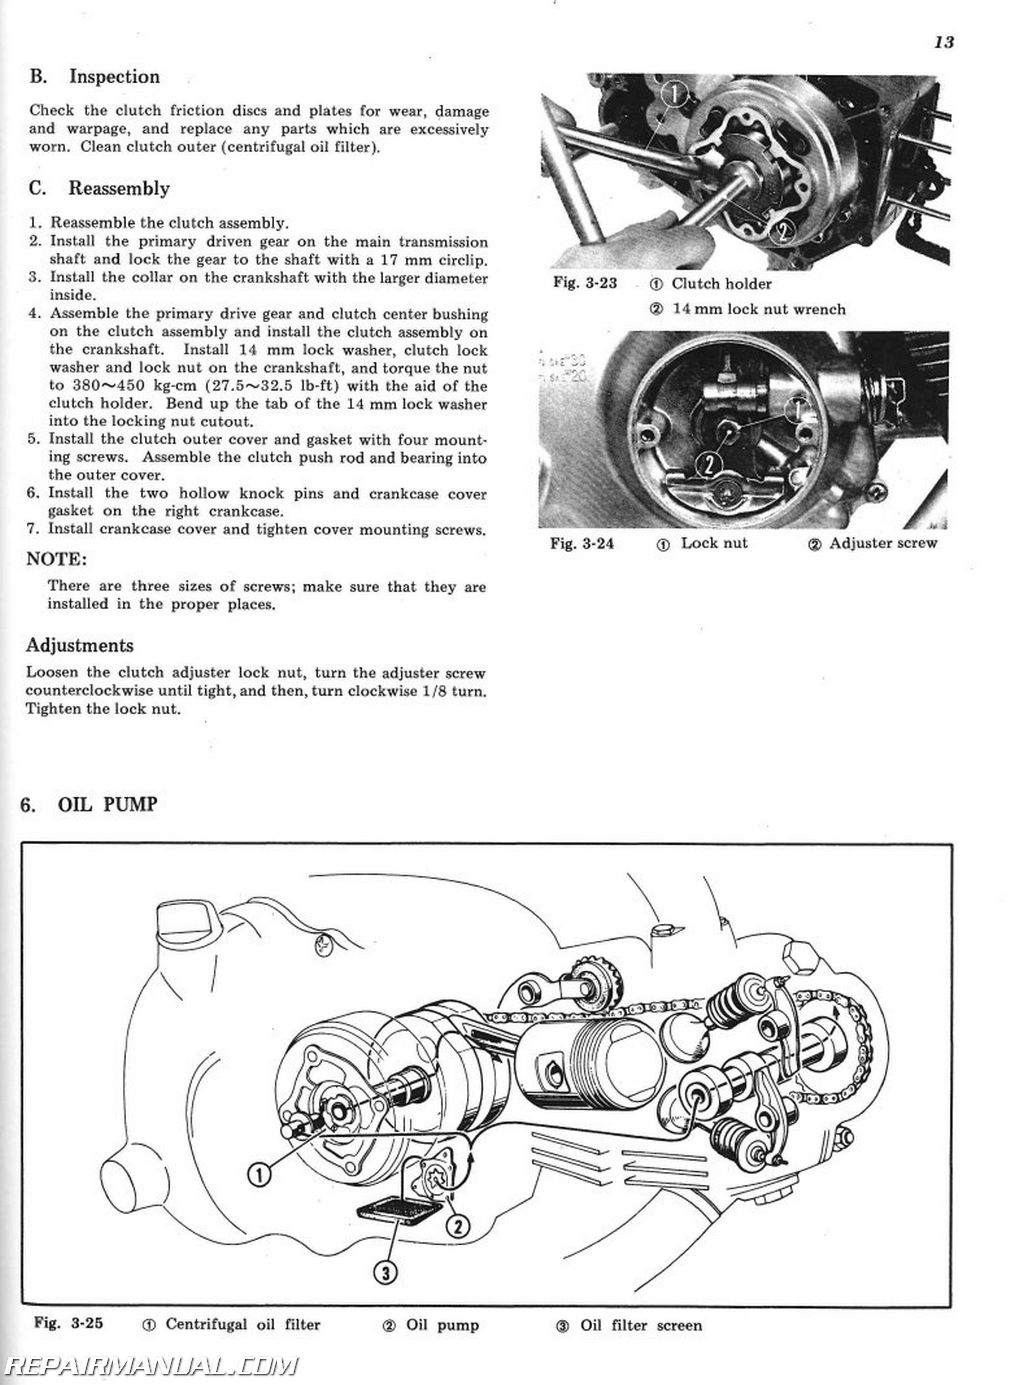 Honda Sl70 Wiring | Manual e-books on honda cx500 wiring-diagram, honda sl350 wiring diagram, honda xl70 wiring diagram, honda ct70 wiring-diagram, honda mt250 wiring diagram, suzuki gs400 wiring diagram, honda zb50 wiring diagram, honda tl125 wiring diagram, honda cb360 wiring-diagram, honda ct110 wiring-diagram, hid headlight wiring diagram, honda crf50 wiring diagram, honda cbr1000rr wiring diagram, honda ca95 wiring diagram, honda z50r wiring diagram, honda cb350 wiring-diagram, honda ct90 wiring-diagram, honda xr80 wiring diagram, honda xr50r wiring diagram, honda st1100 wiring diagram,